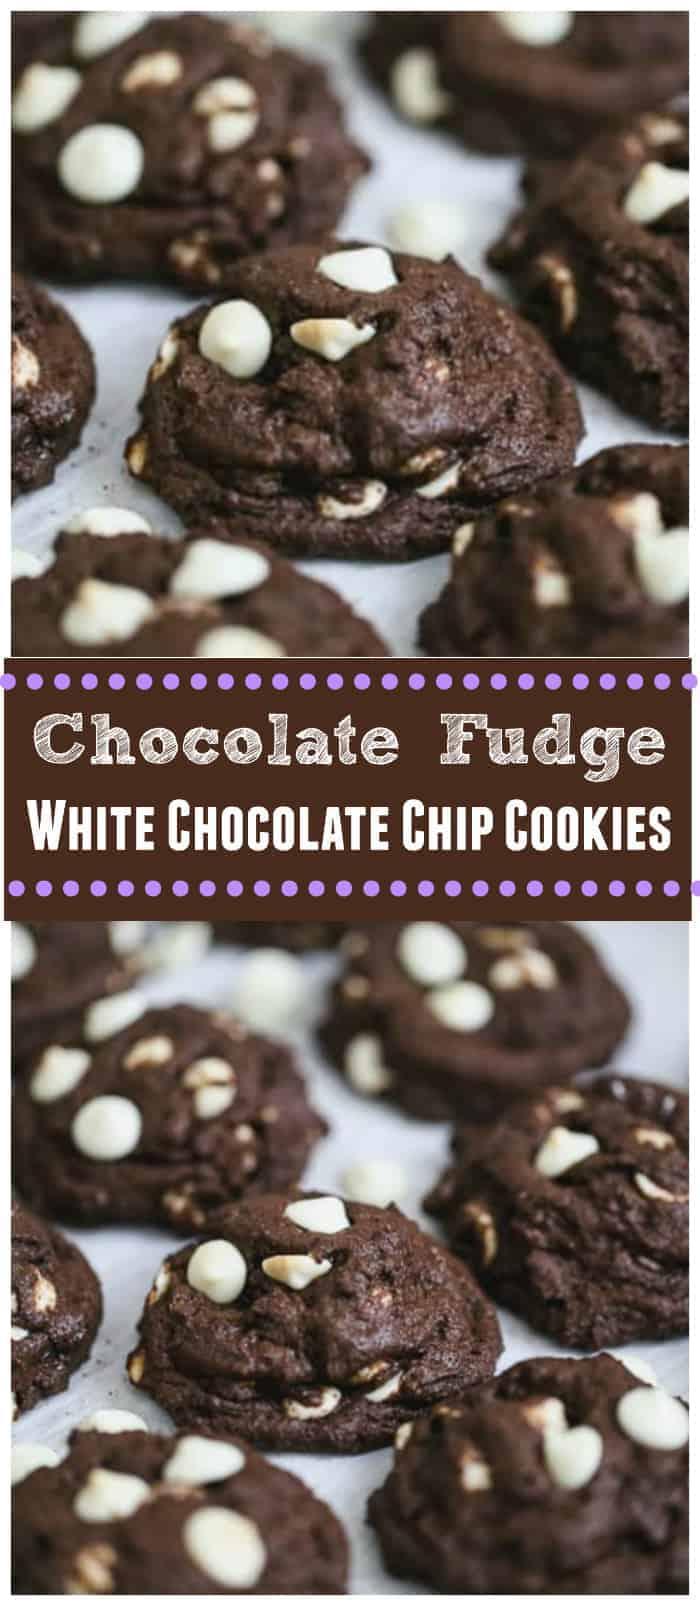 Chocolate Fudge White Chocolate Chip Cookies - Vegan & GF Options